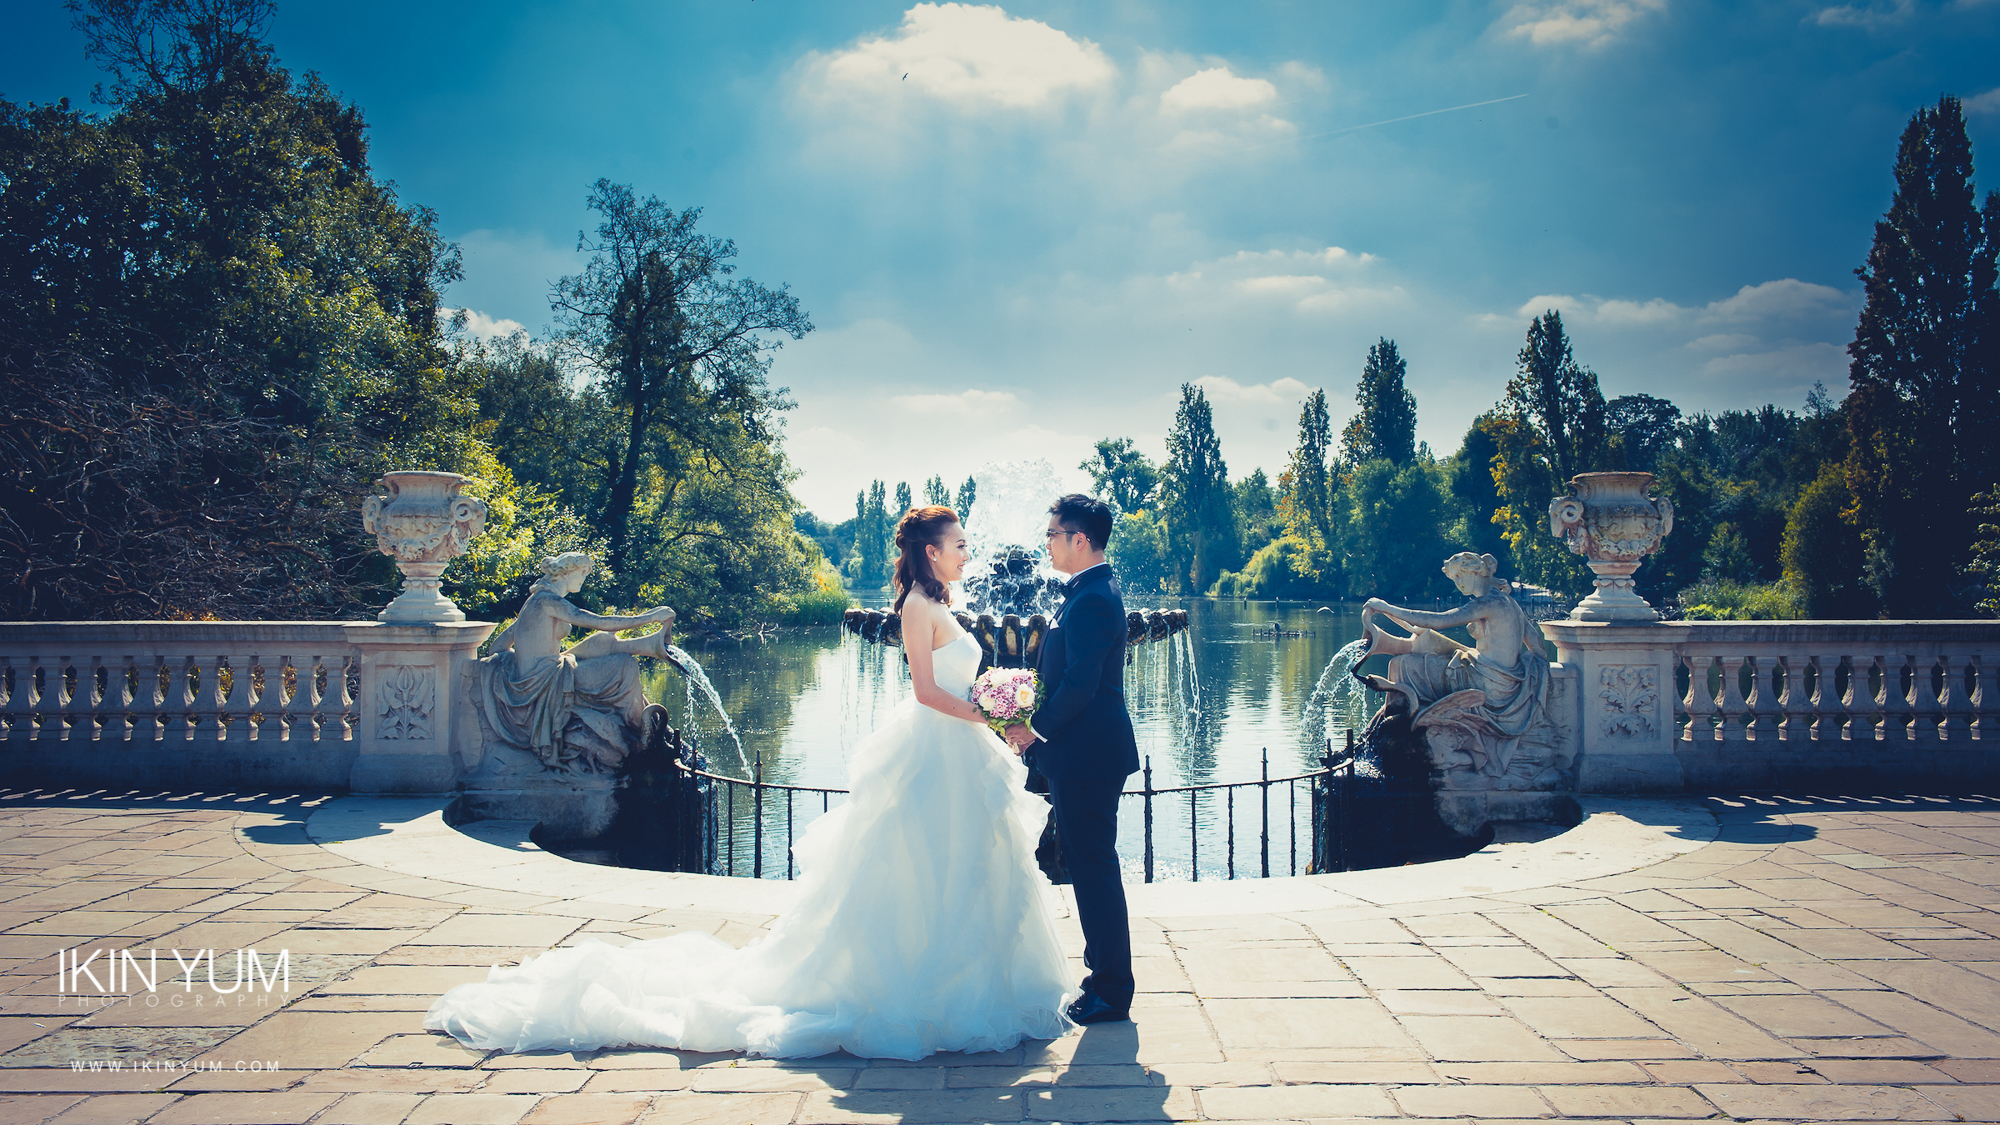 Joyce & Donald Pre Wedding Shoot - Ikin Yum Photography-008.jpg